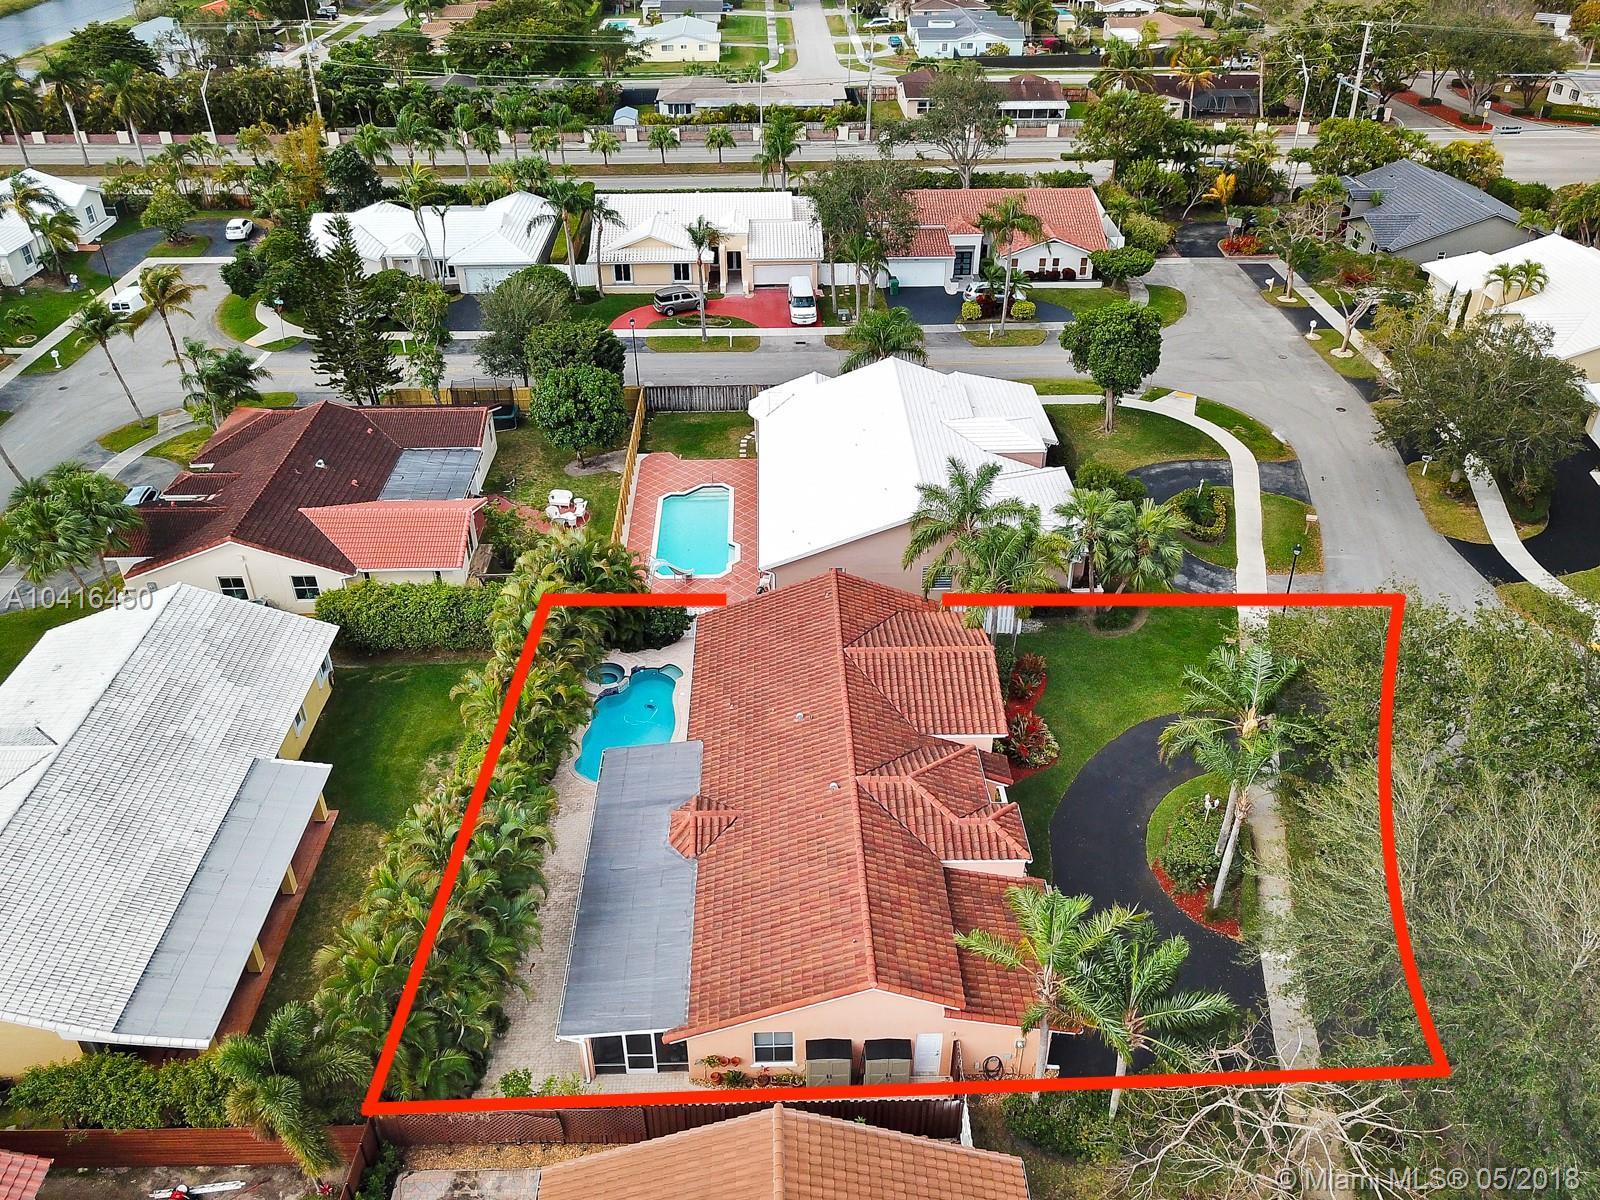 8542 Sw 82nd Ter, Miami FL, 33143